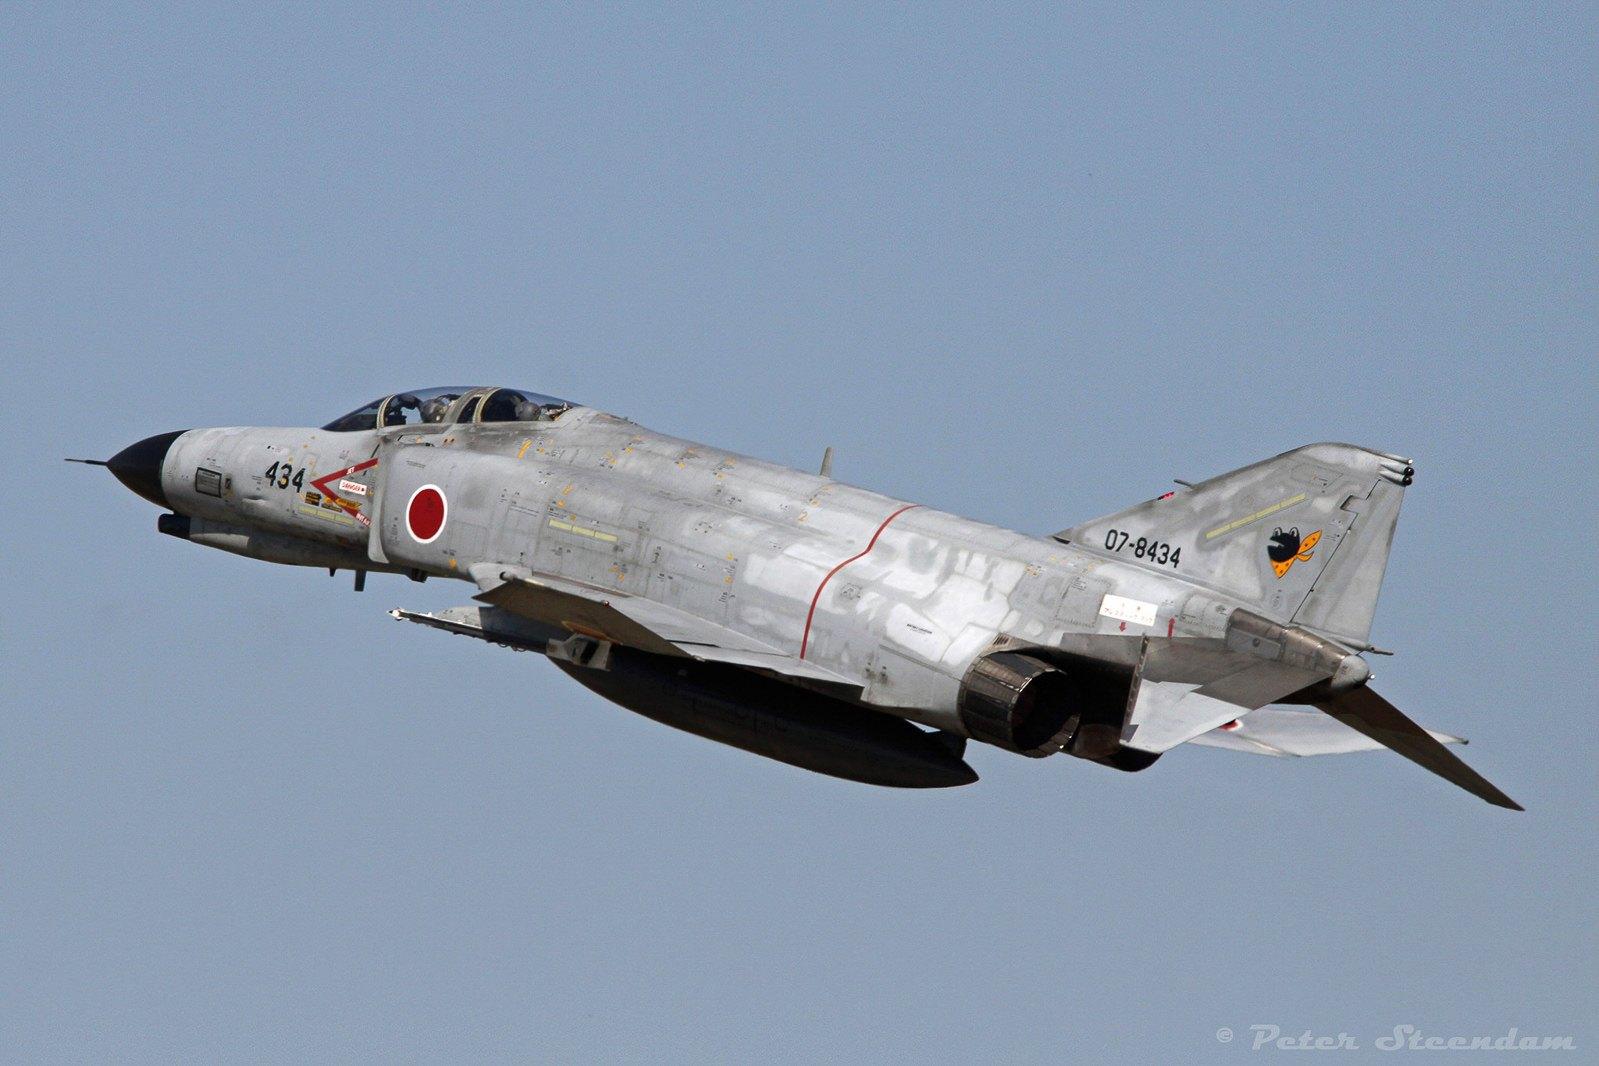 f-4ej-07-8434-301-tfs-take-off_mod_fb